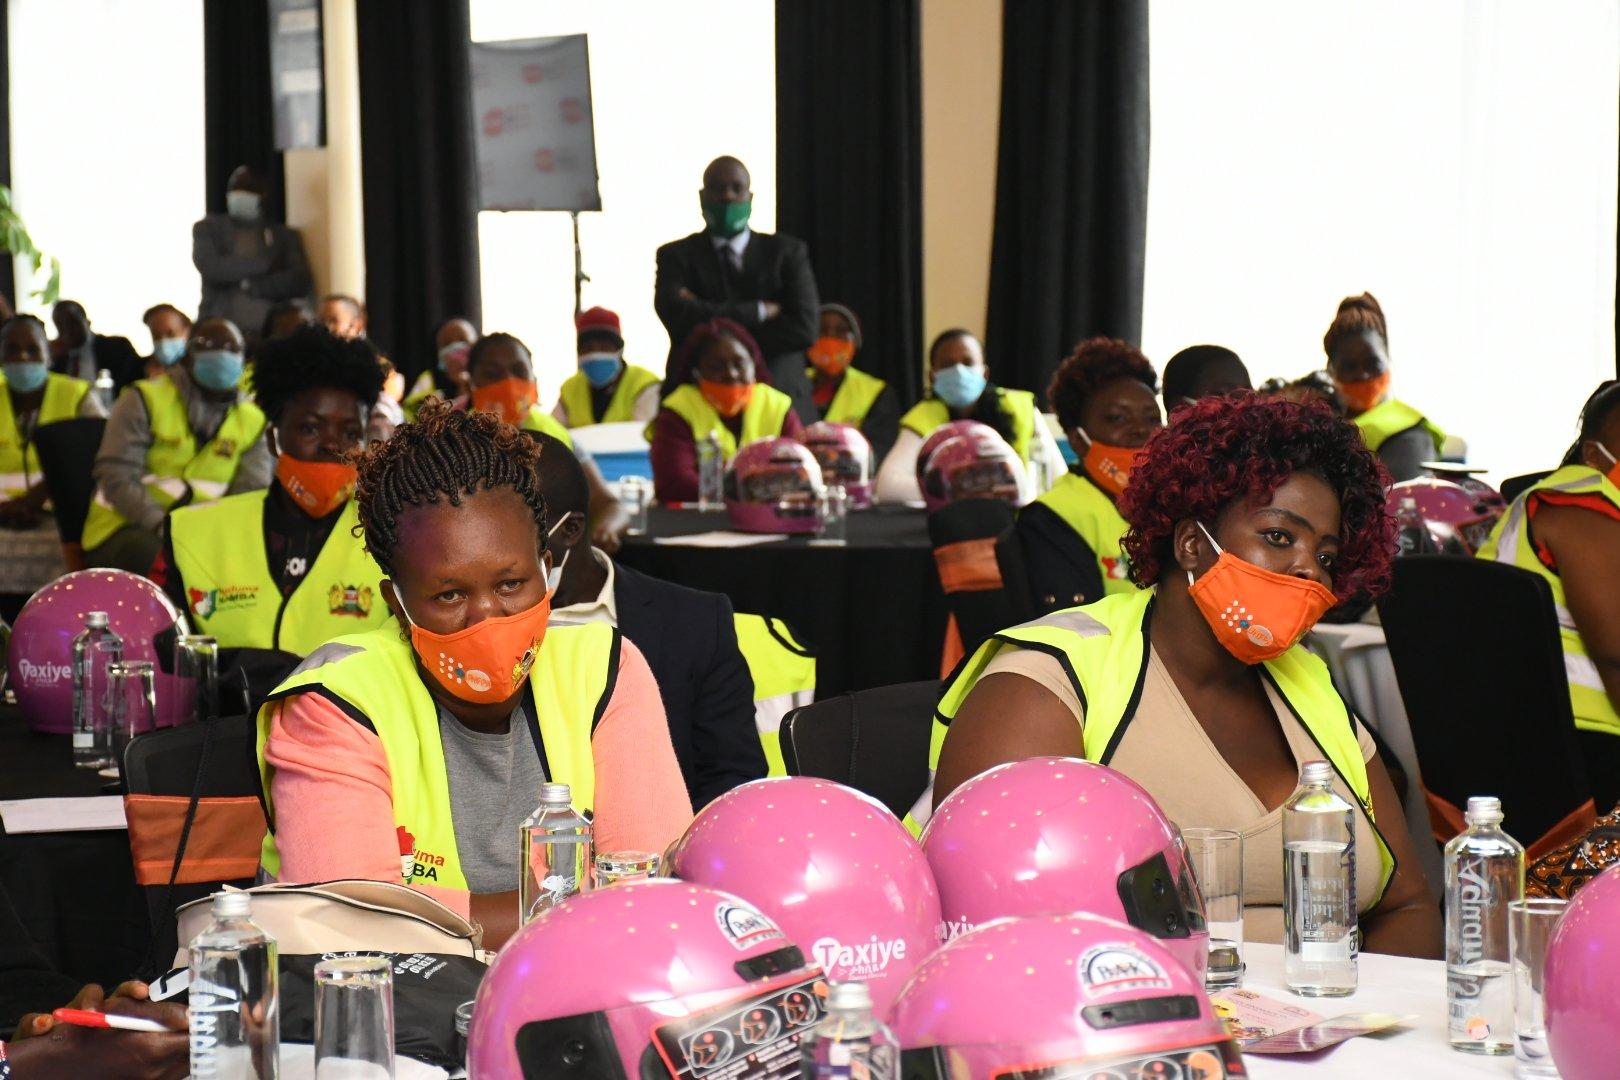 Image of female boda boda riders attending an event in Nairobi on October 26, 2020